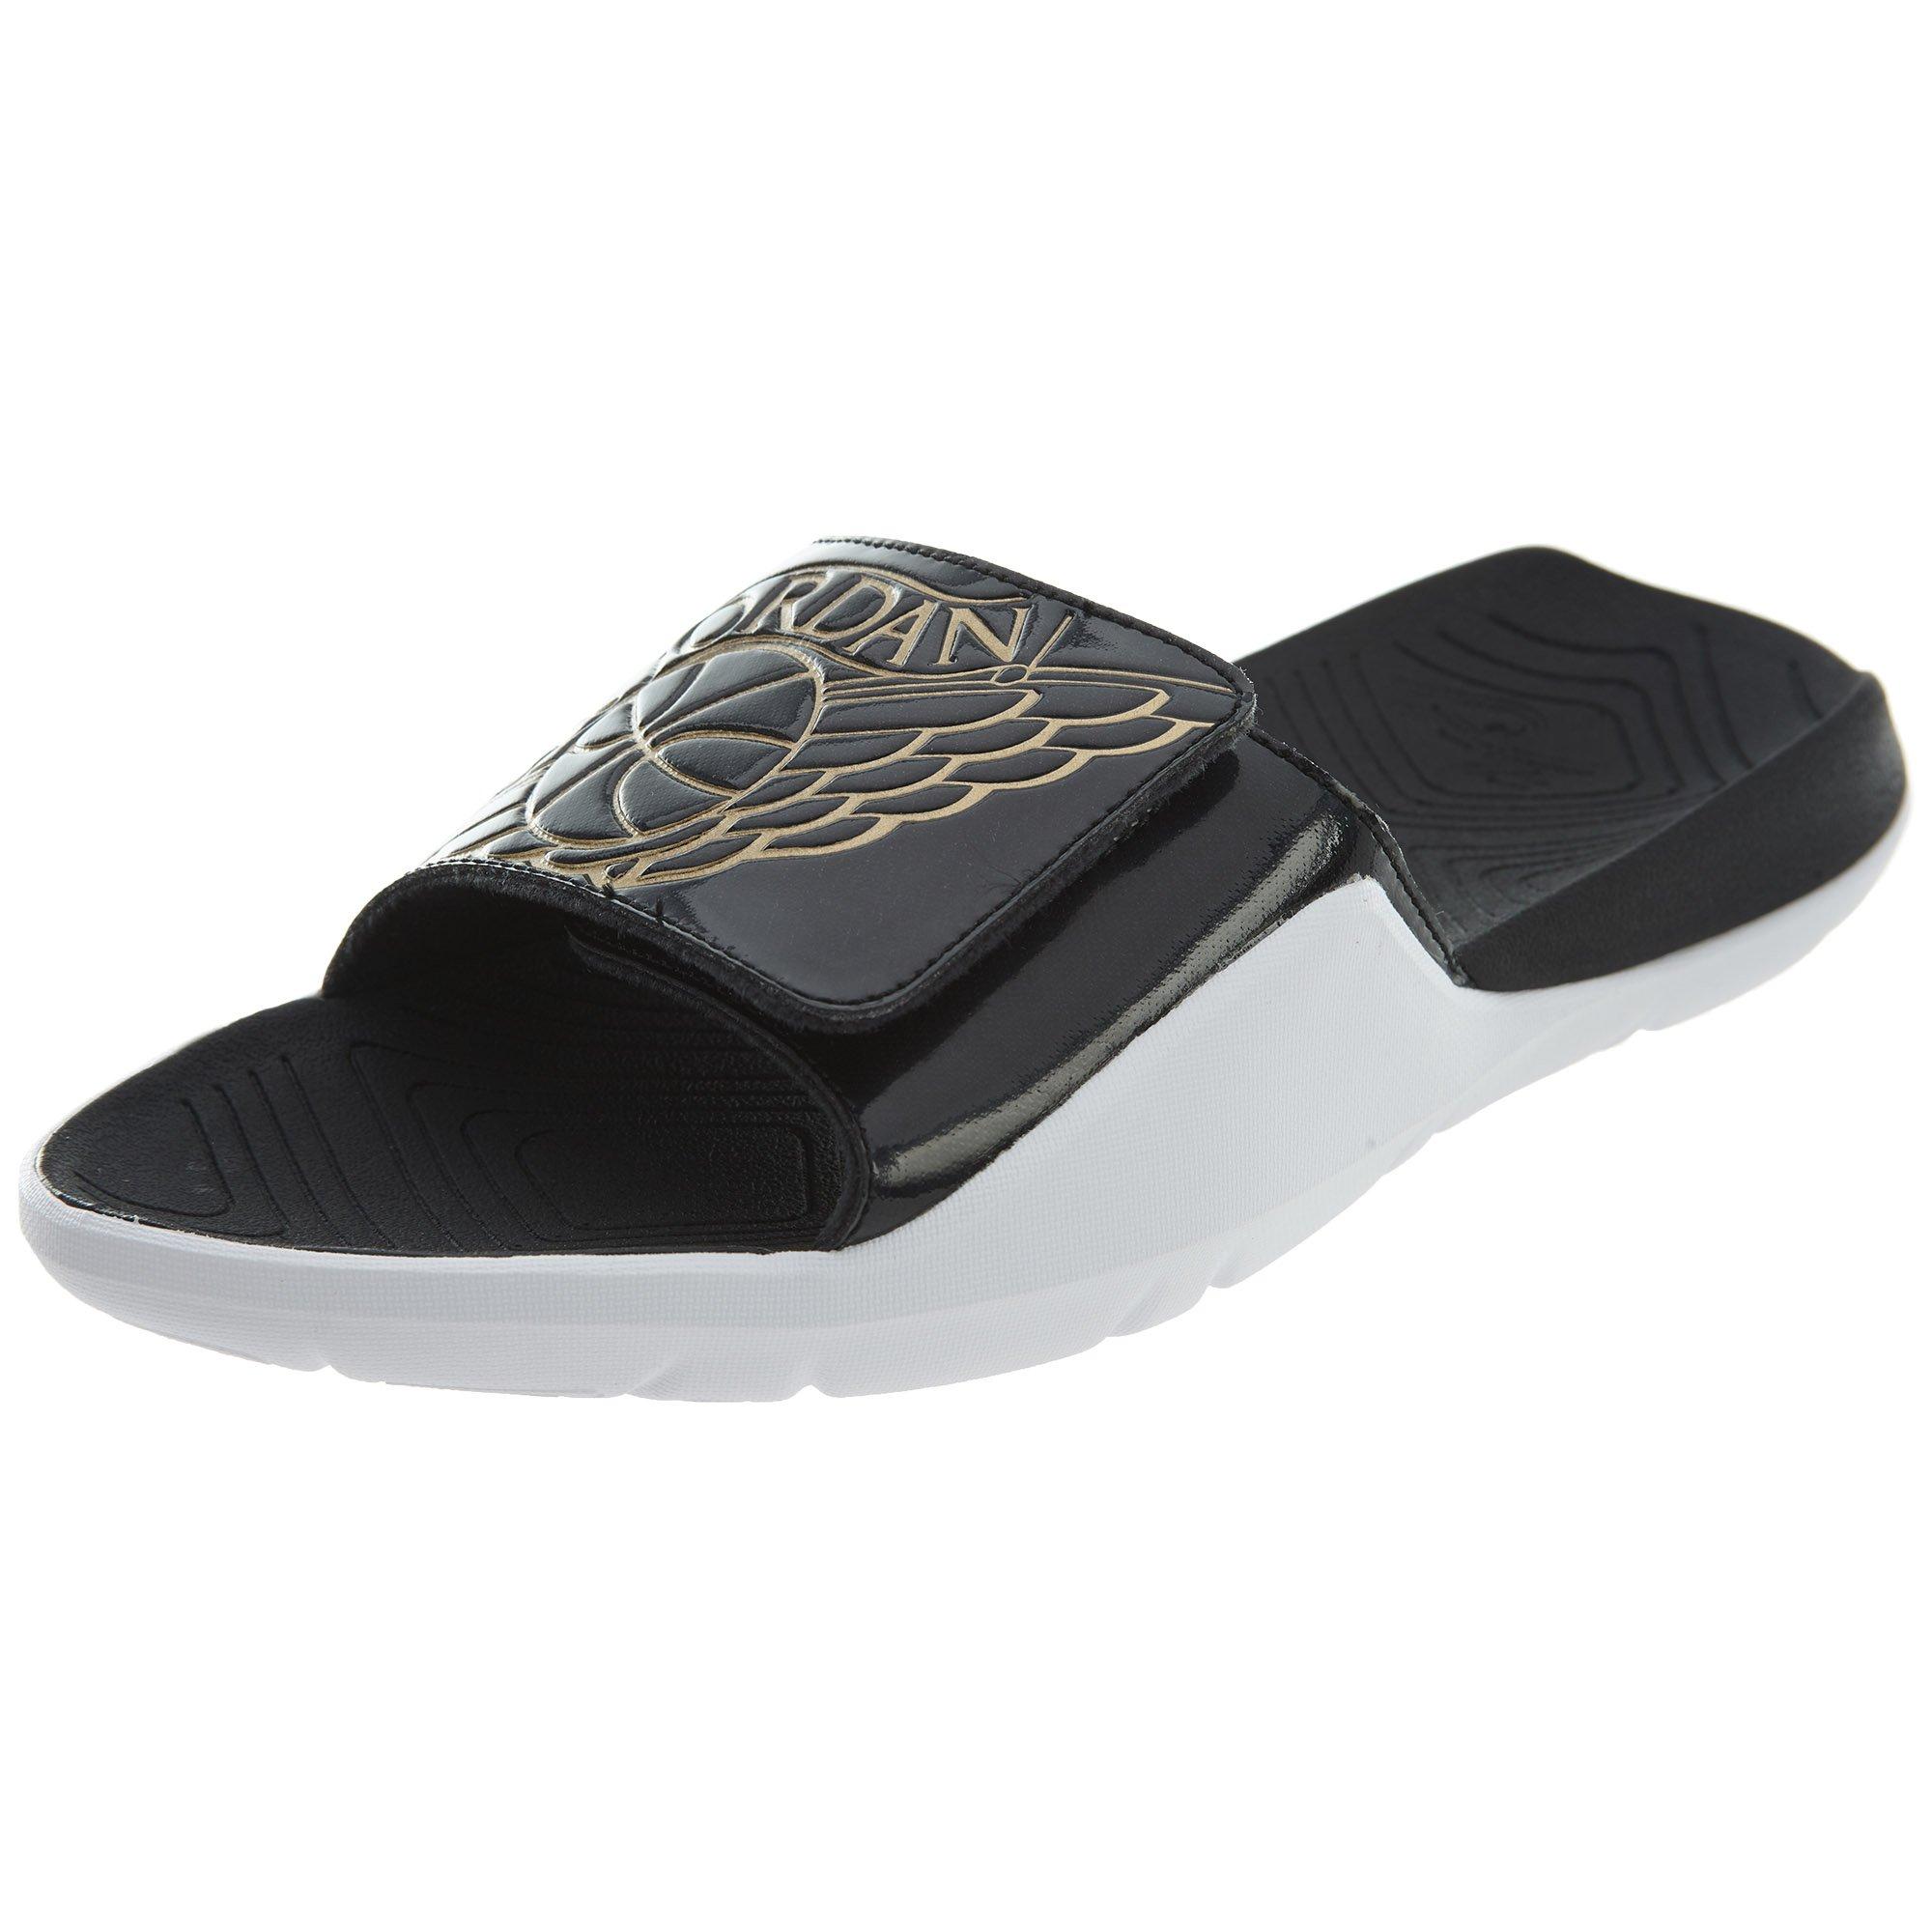 Galleon - Jordan Hydro 7 Men s Slide Sandals AA2517-021 Size 10 c43788a67